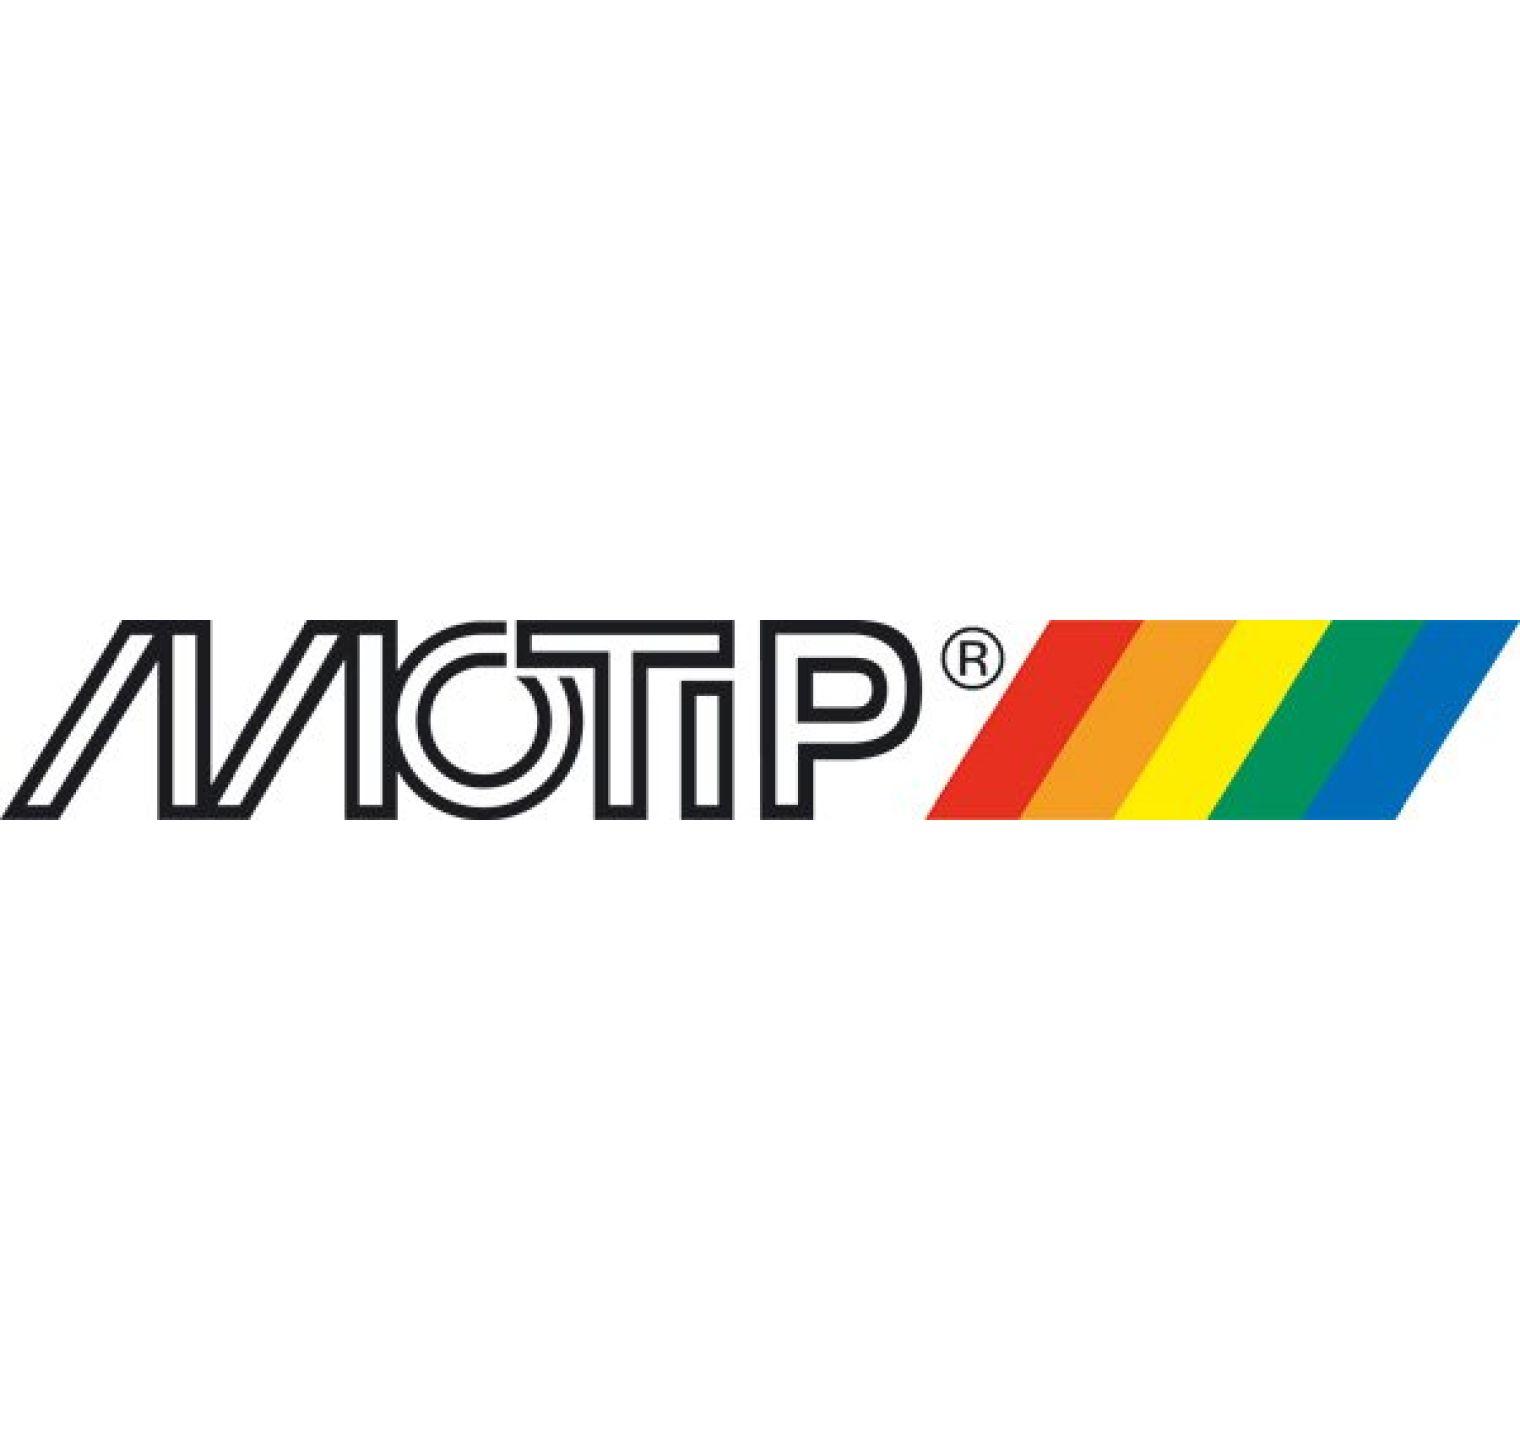 Motip Pol Rep Set 250gr